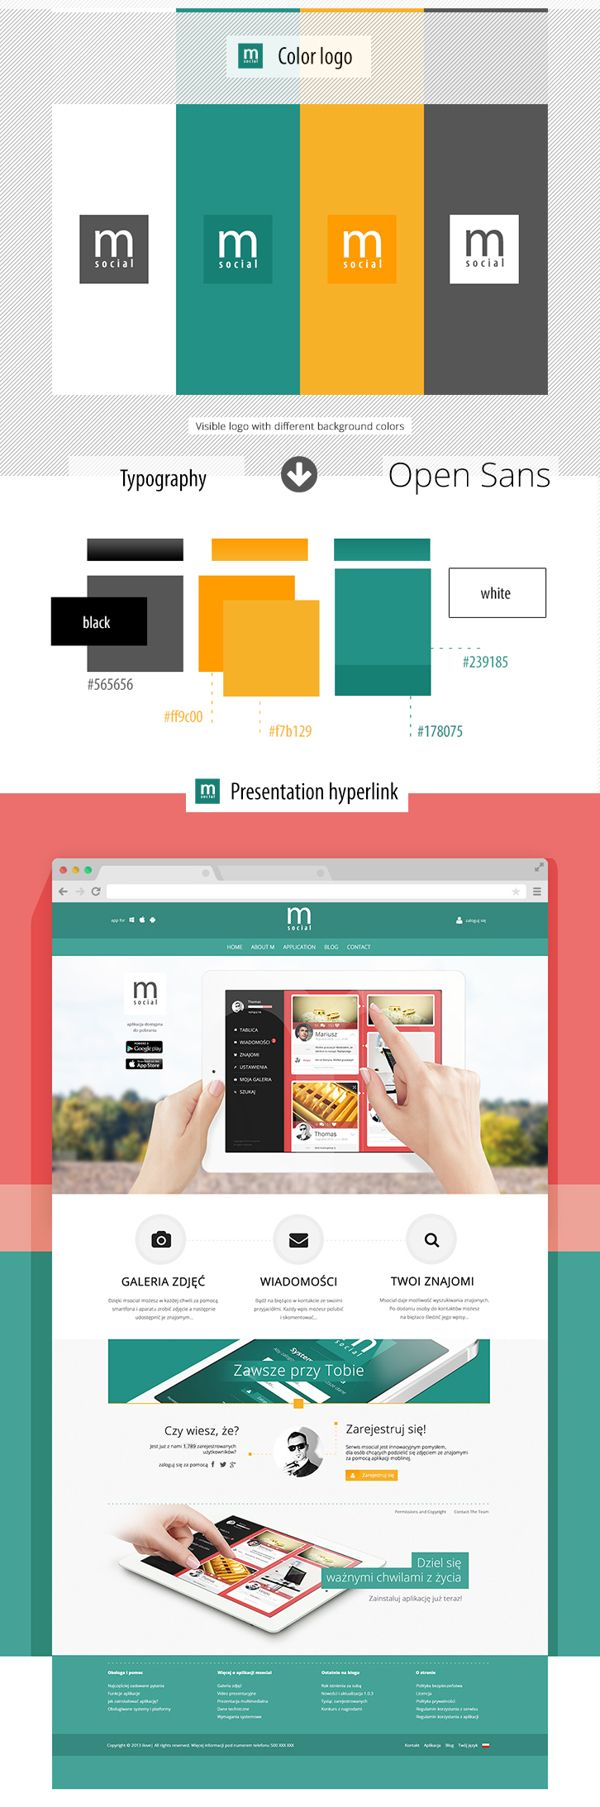 https://www.behance.net/gallery/13504741/Msocial-web-design-app-admin-panel